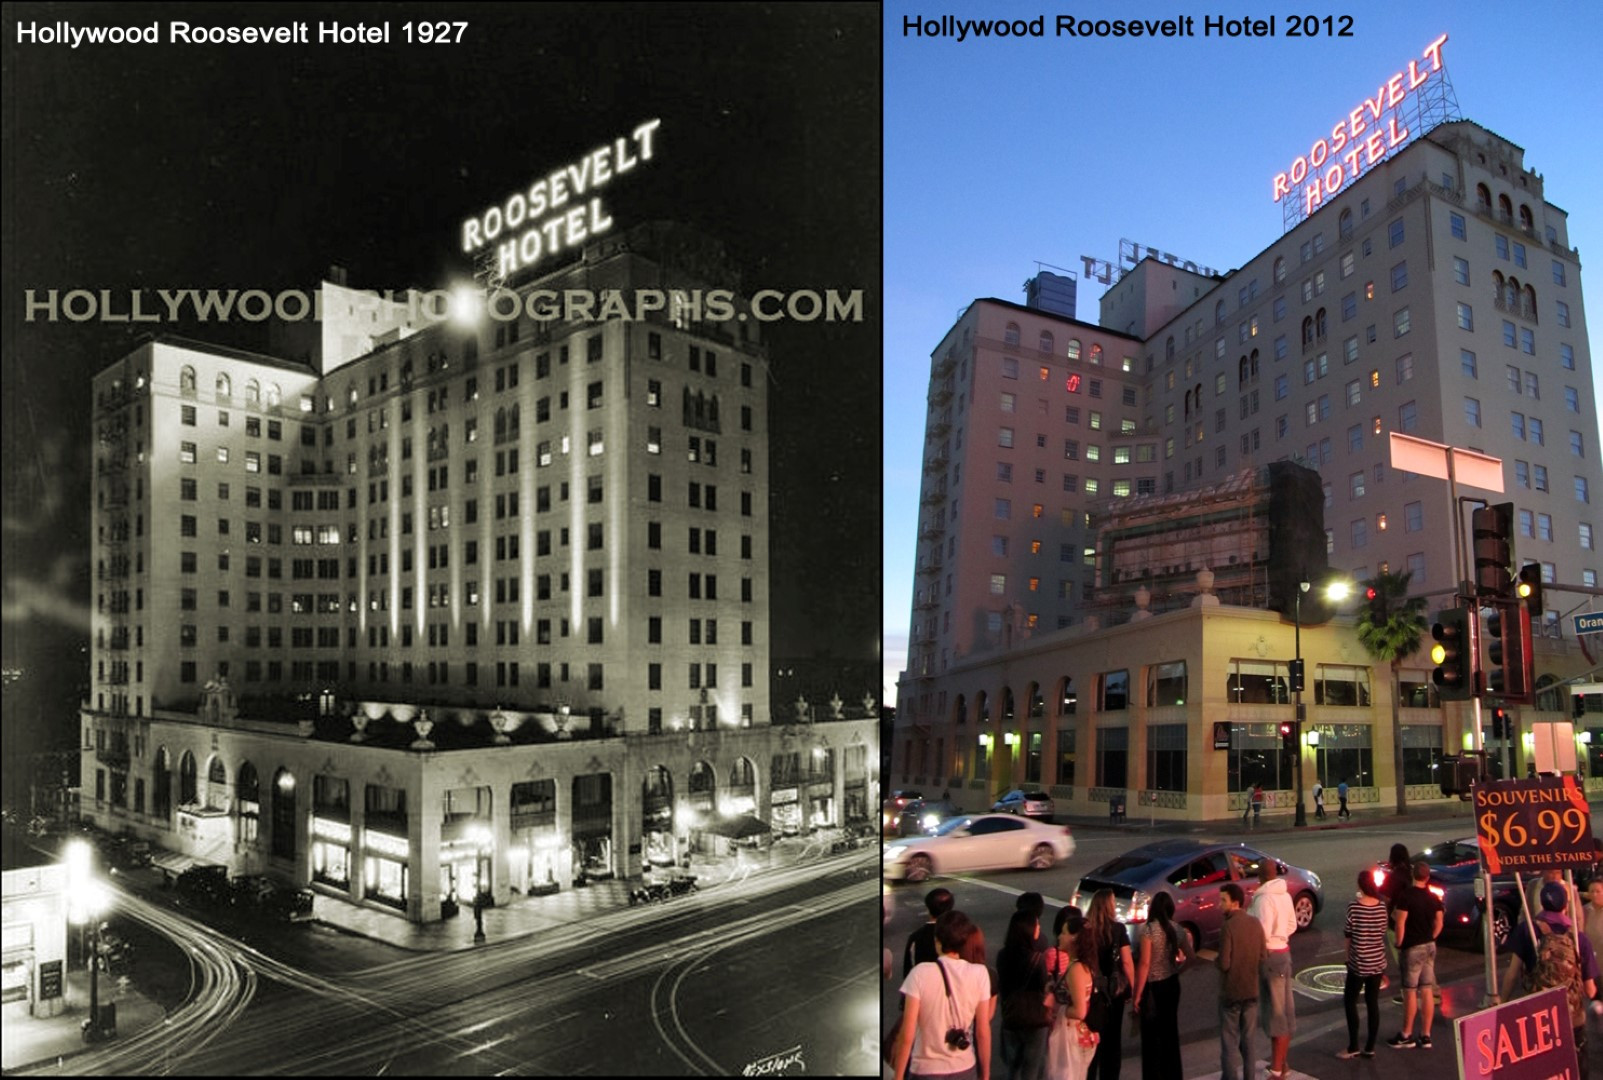 Hollywood Roosevelt Hotel 1927 & 2012